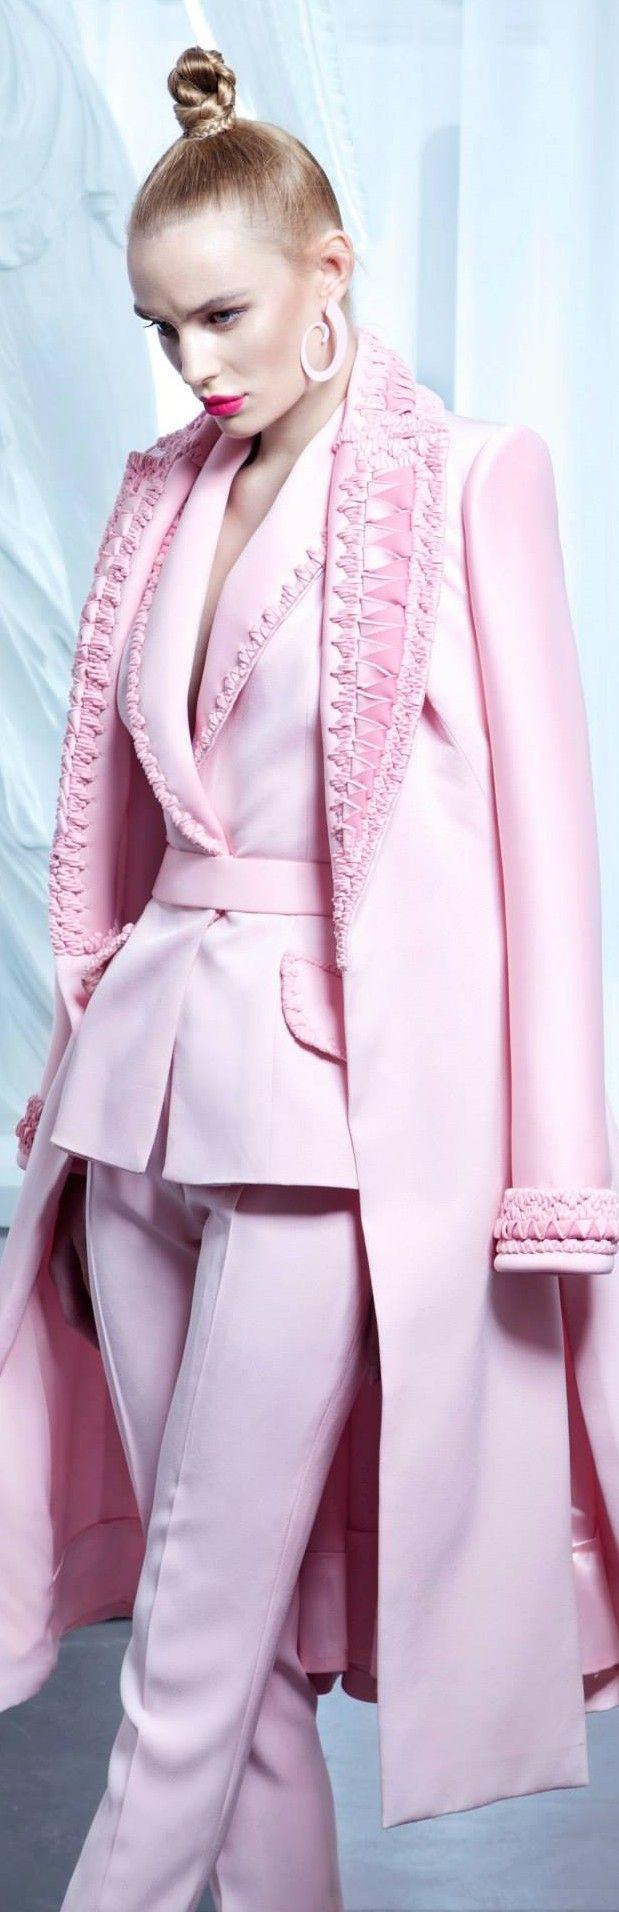 Nicolas Jebran couture 2015 | High End Fashions | Pinterest | Rosas ...